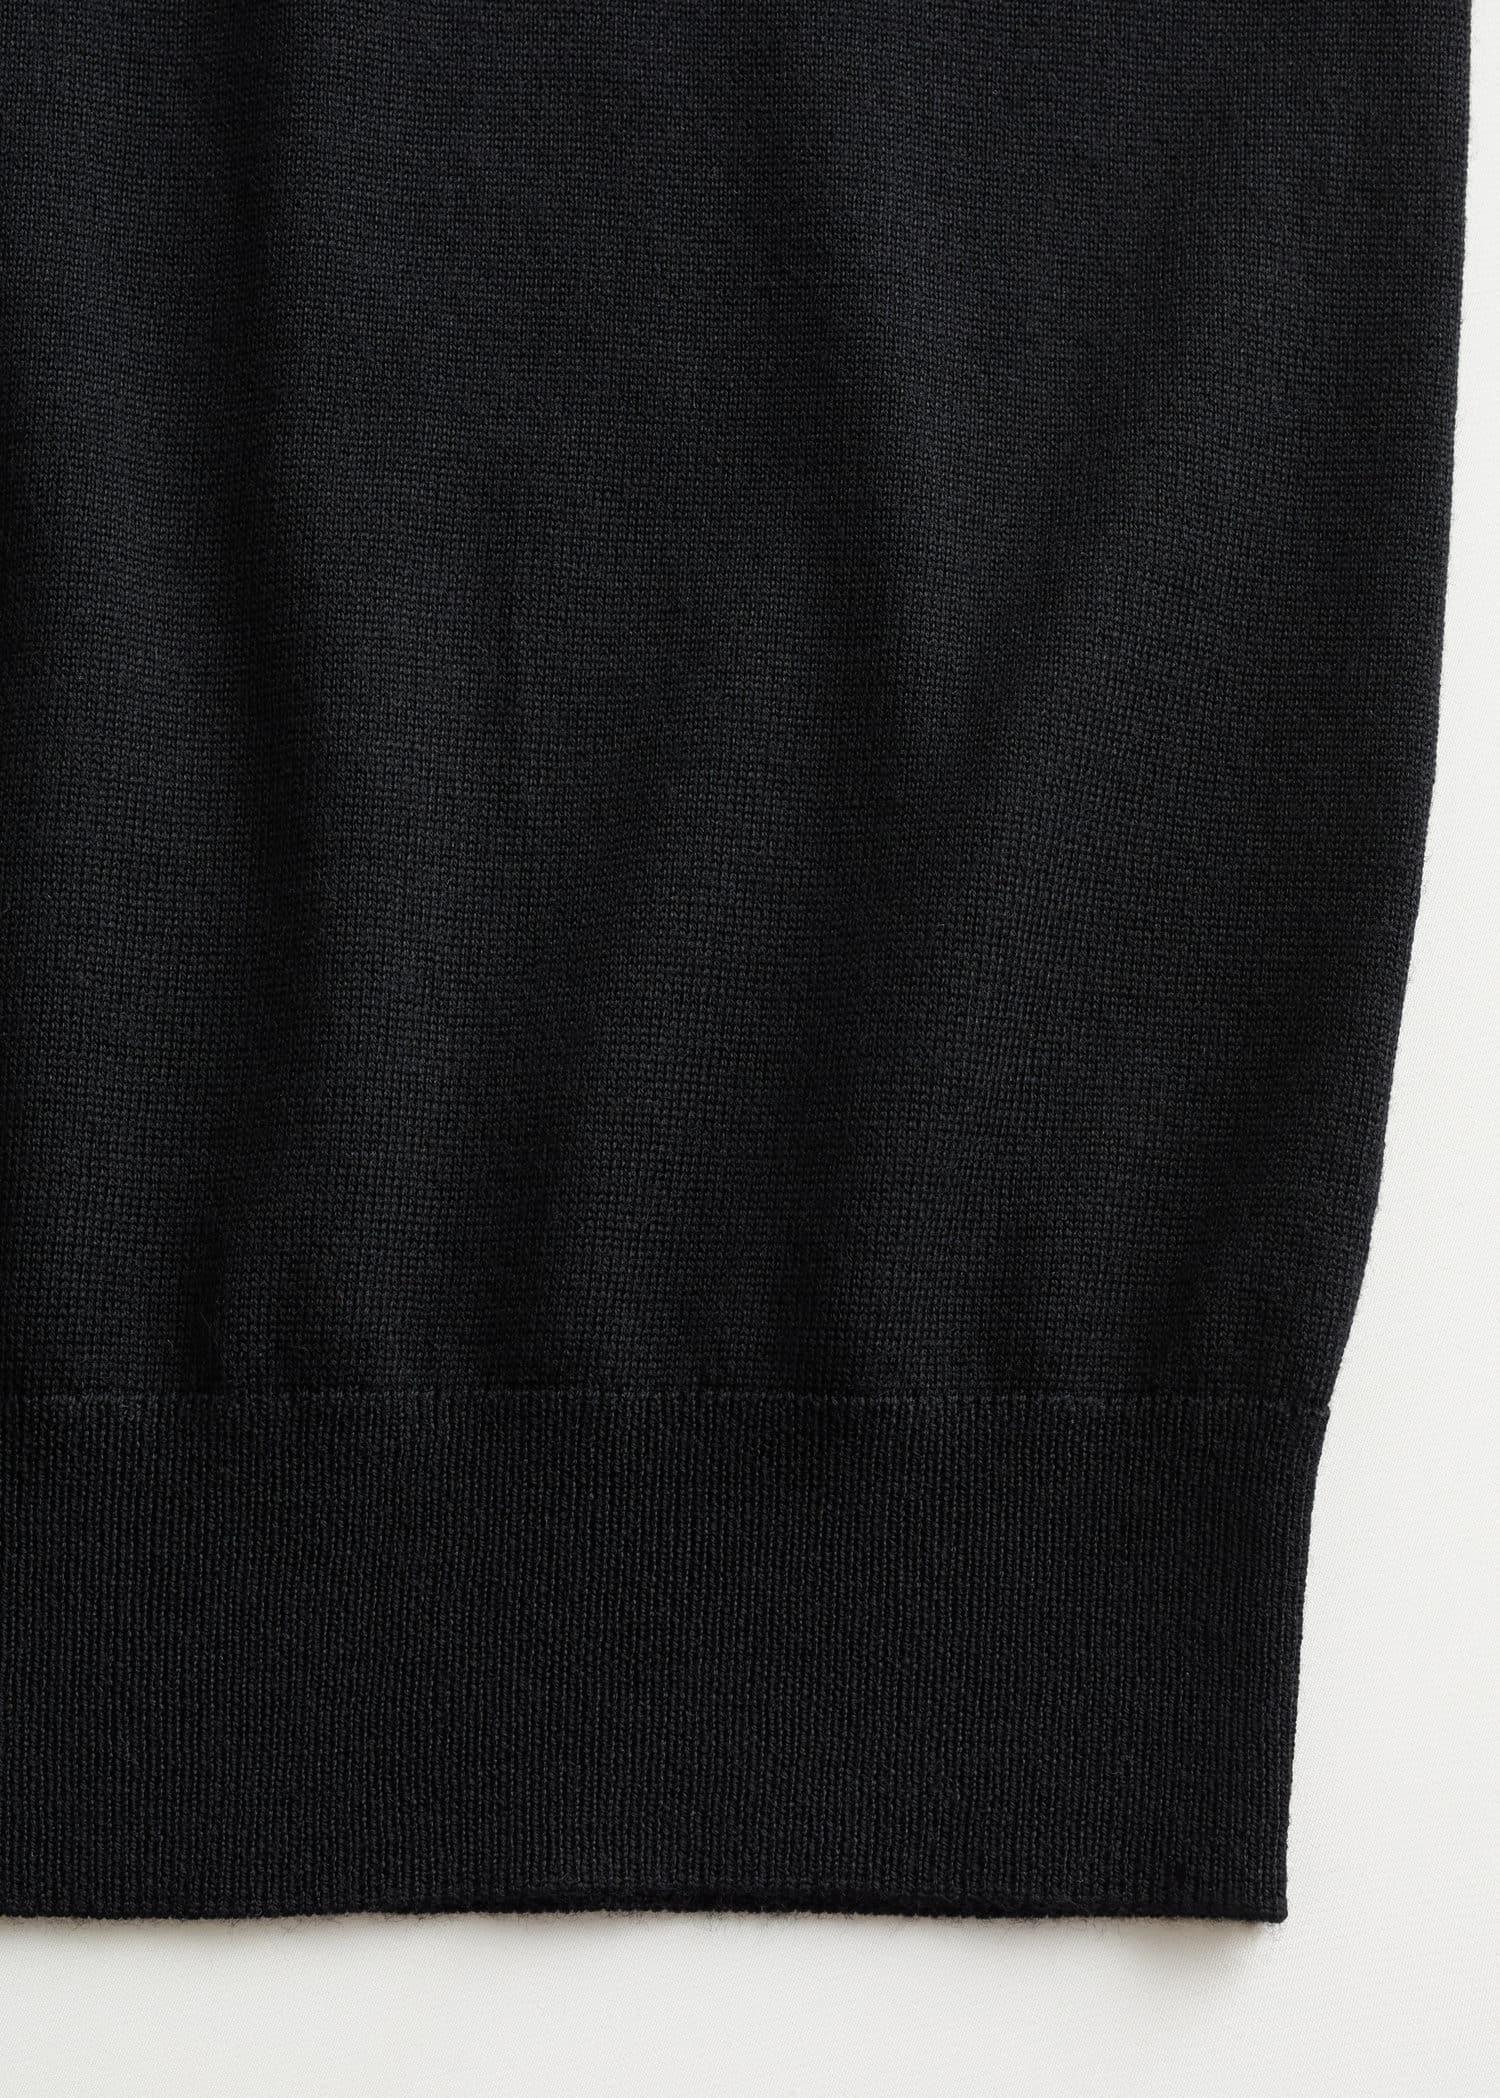 100% merino wool washable sweater Man | Mango Man Singapore